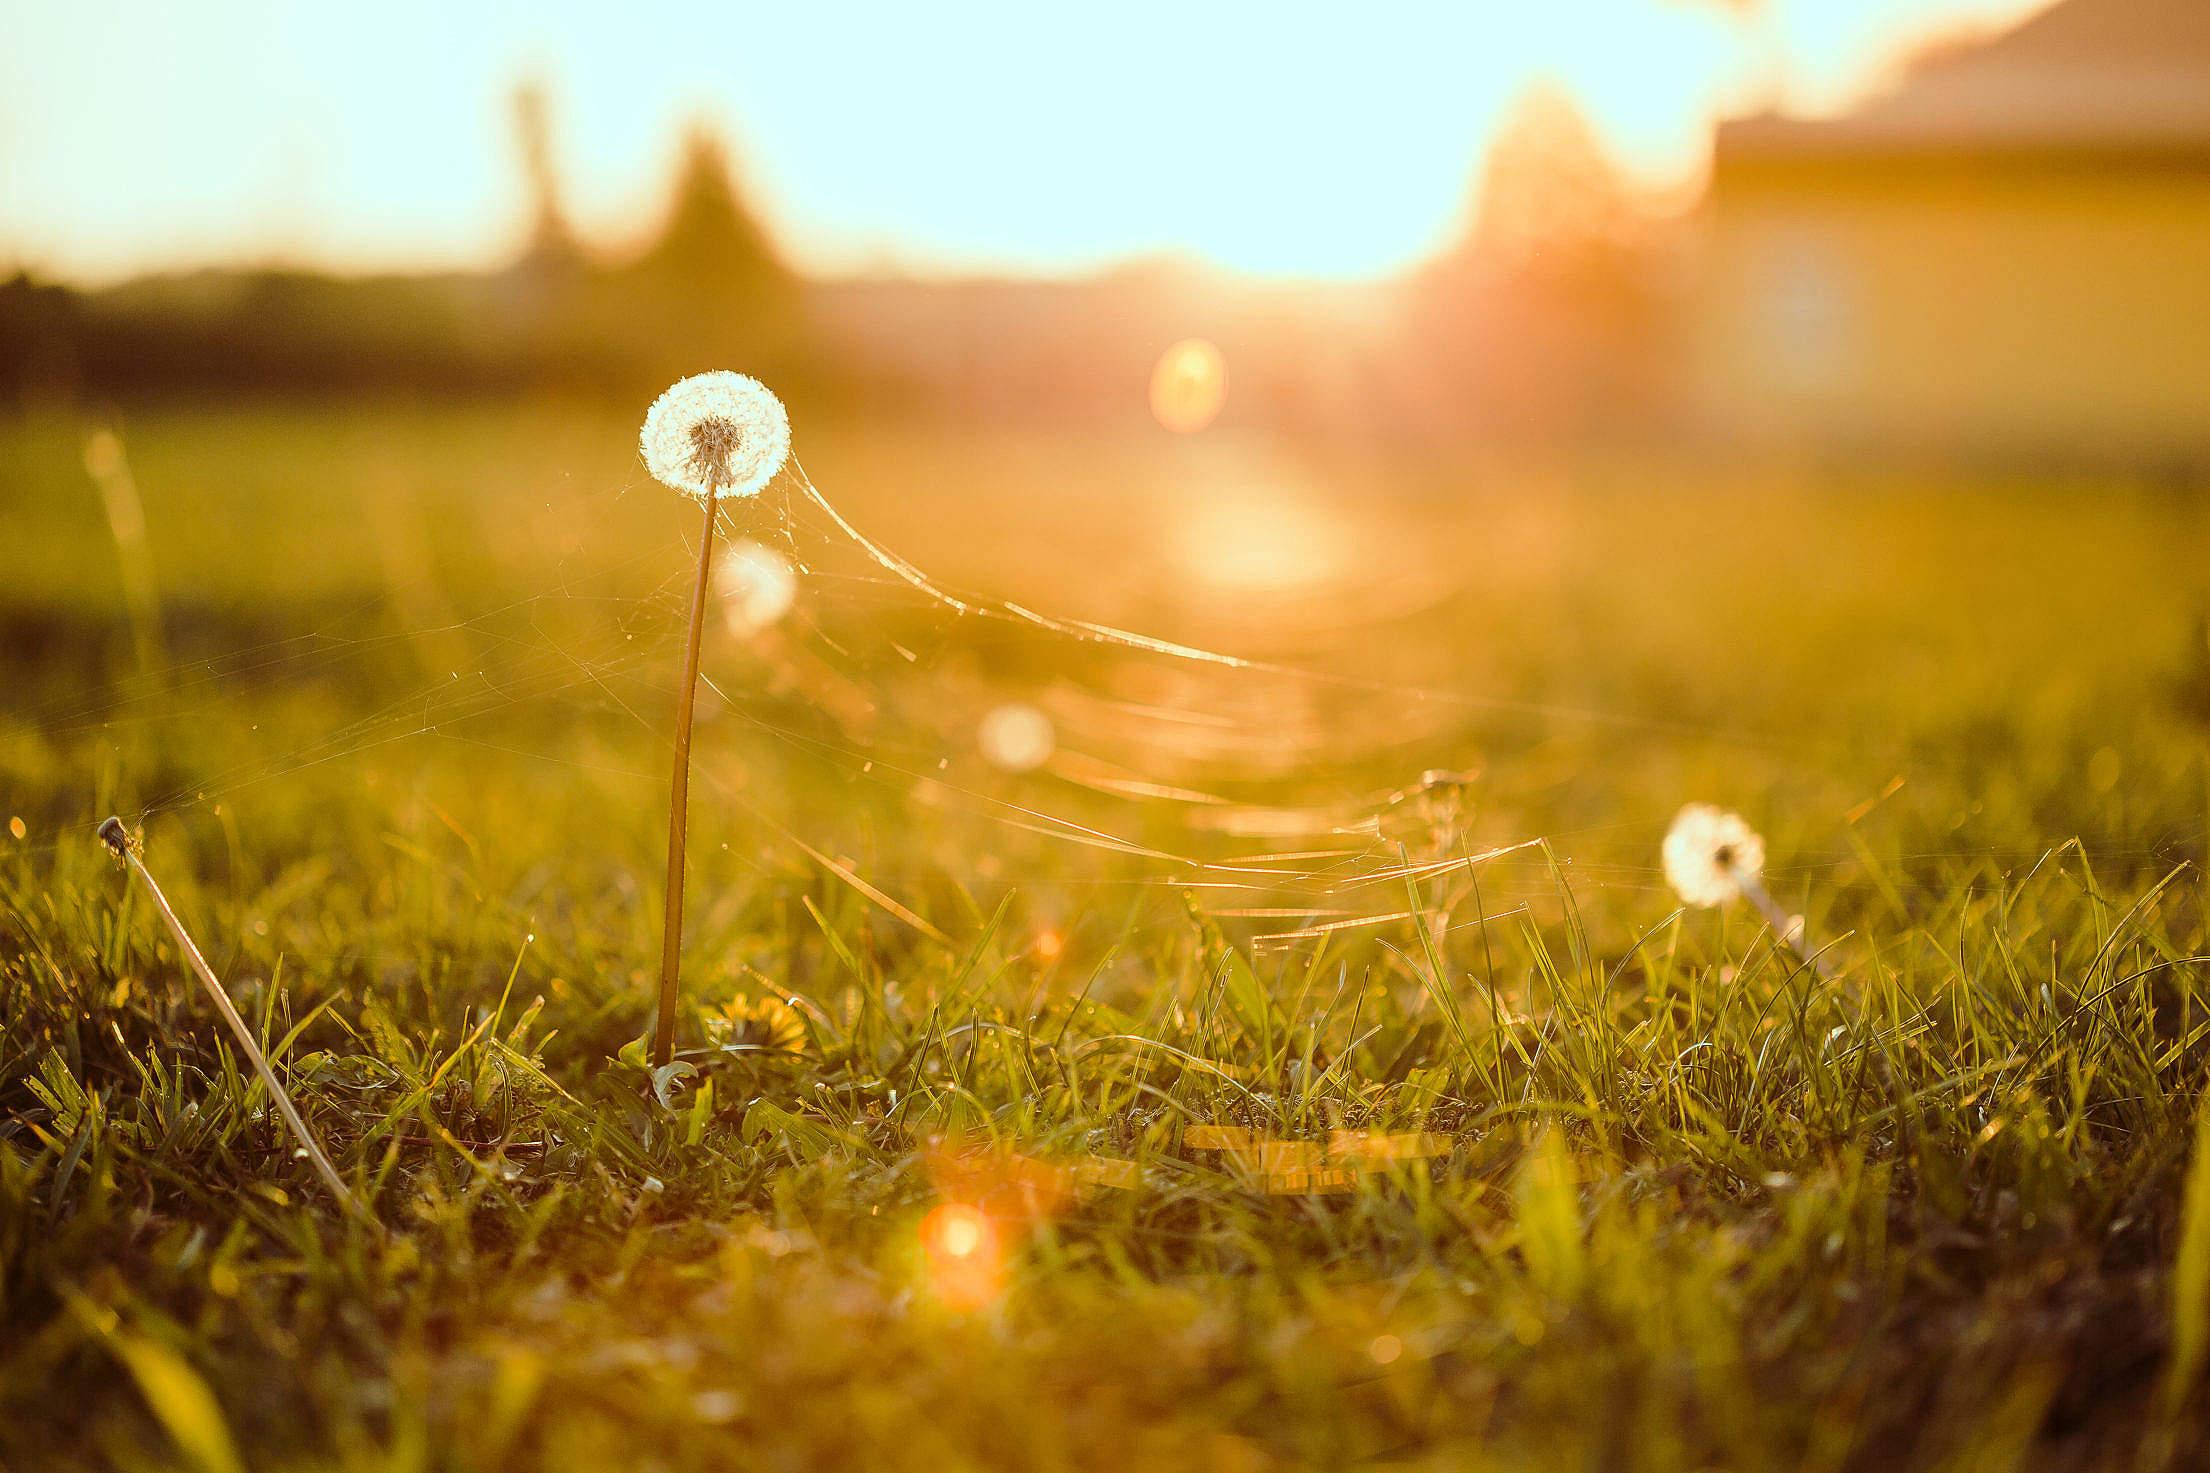 Dandelion with Cobweb Free Stock Photo